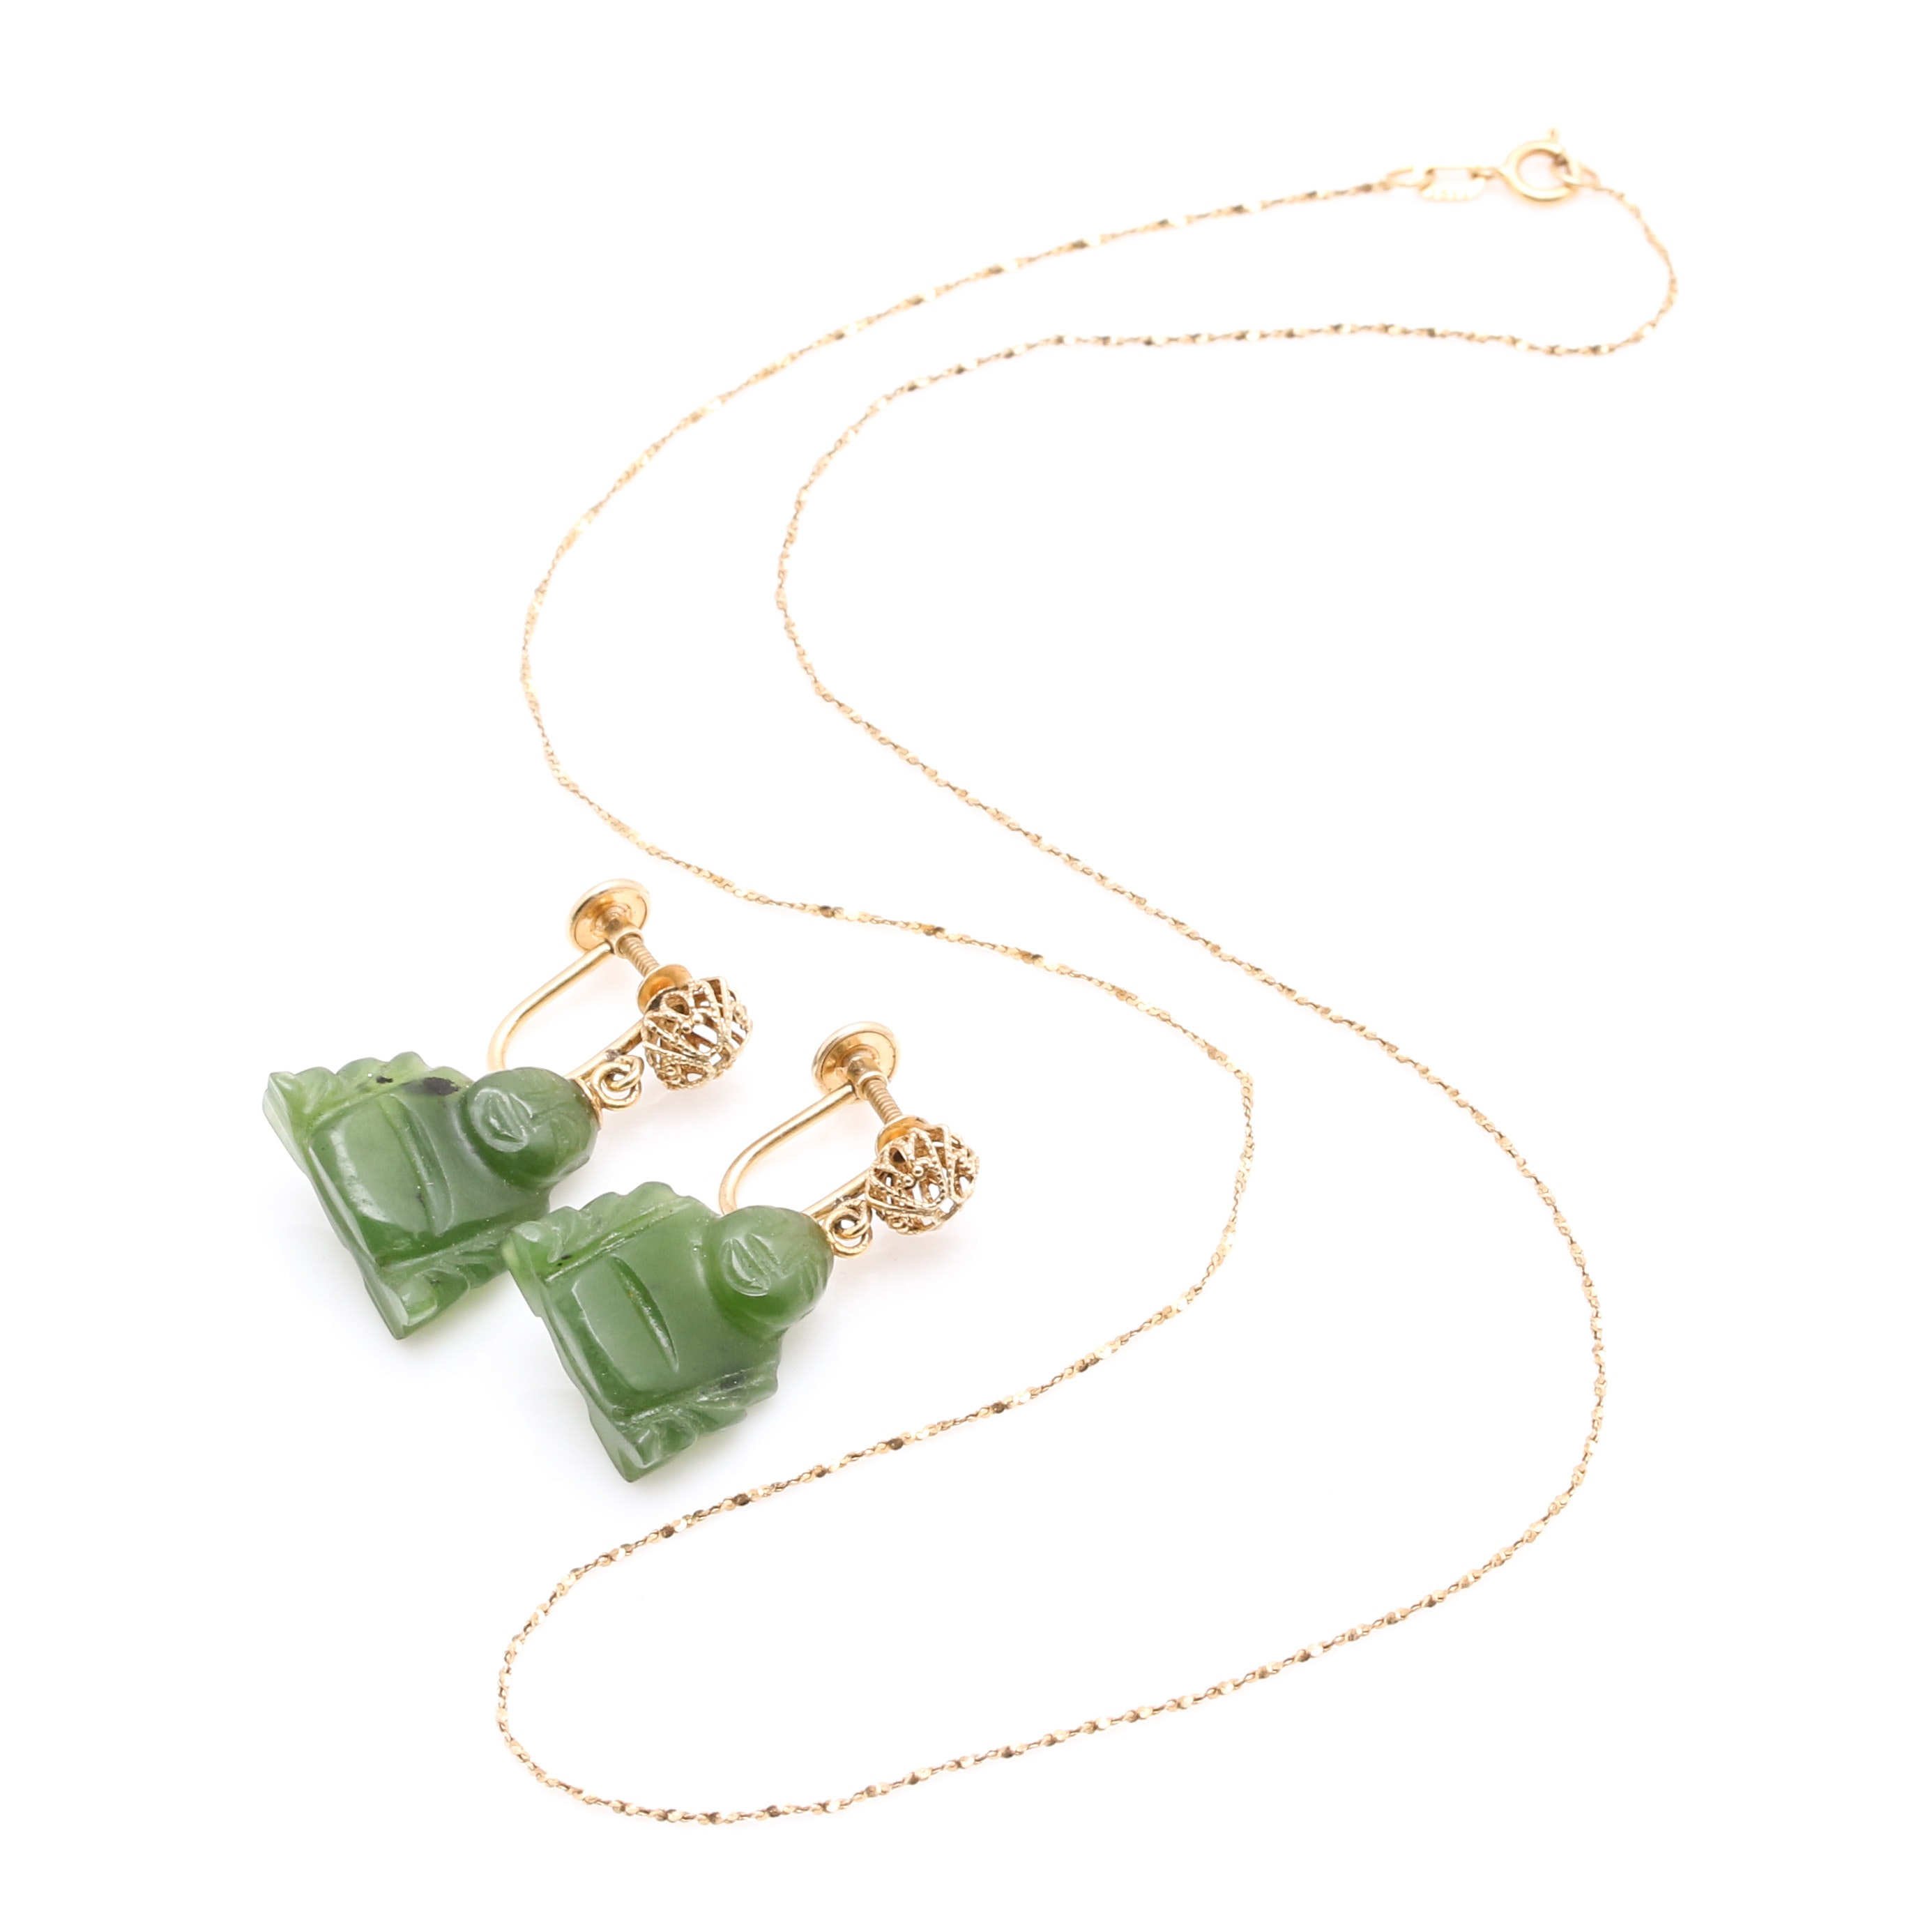 14K Yellow Gold Chain and Nephrite Buddha Earrings